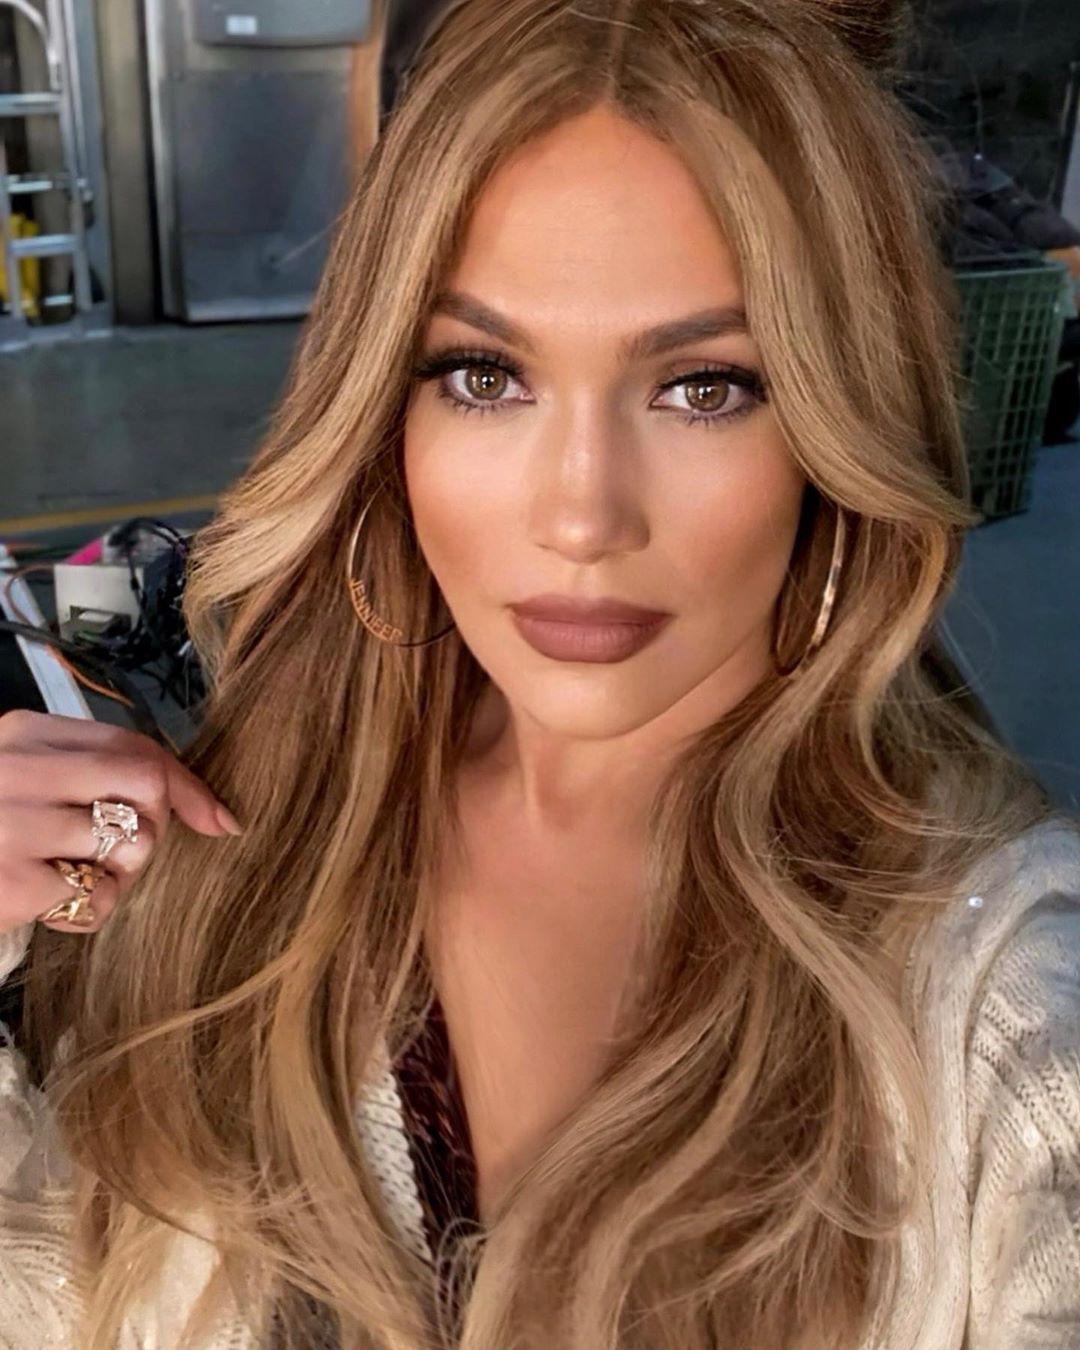 To trick της J.Lo τώρα που δεν μπορεί να πάει στο κομμωτήριο